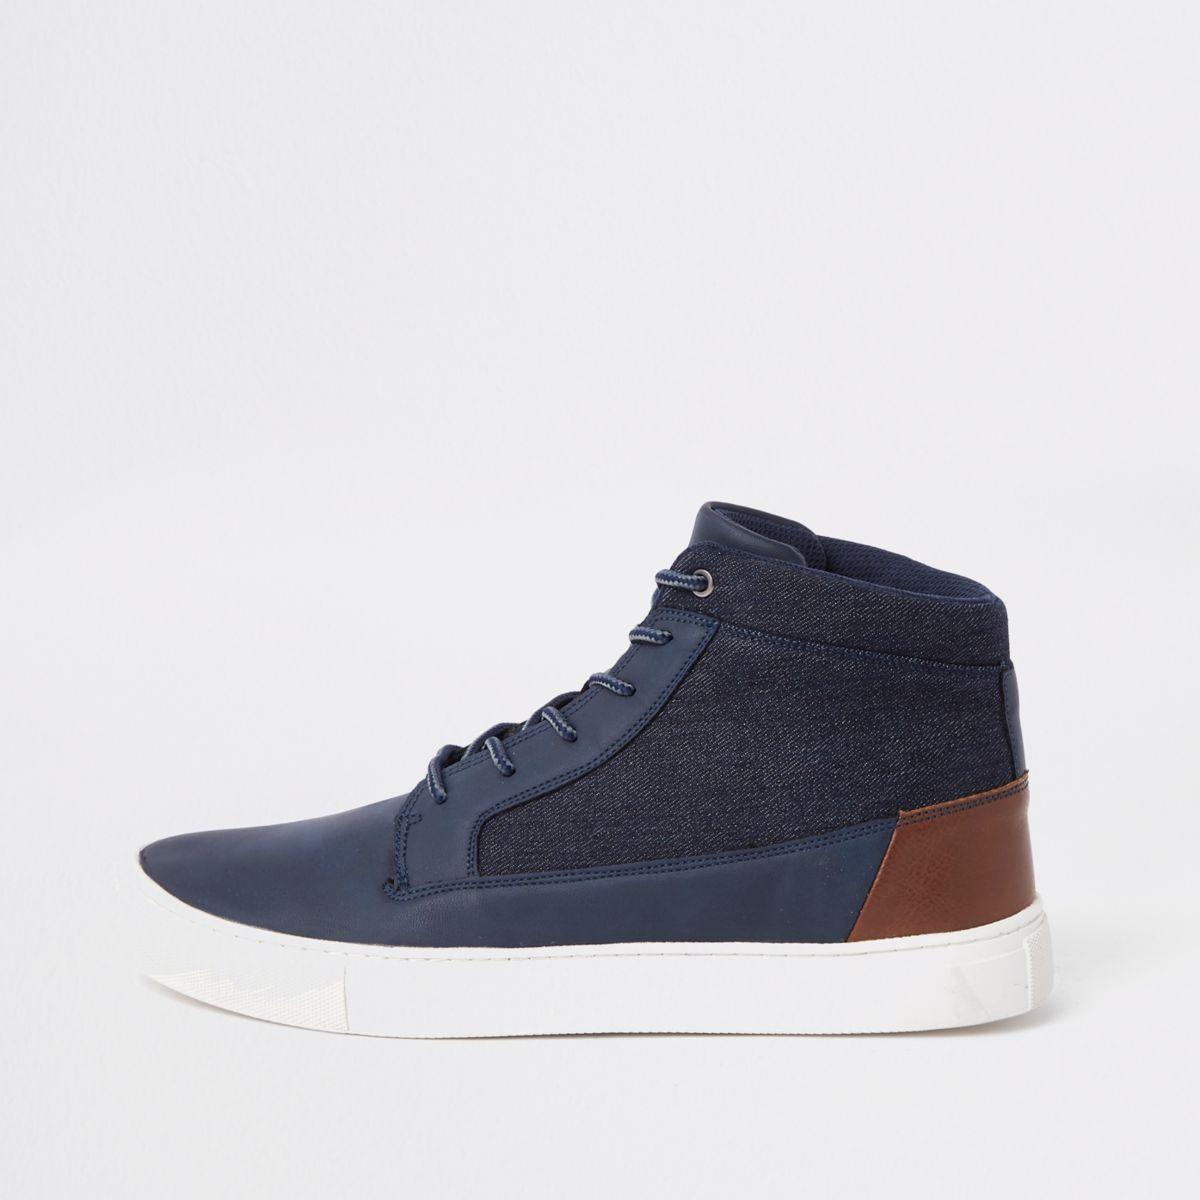 Navy wide fit high top sneakers